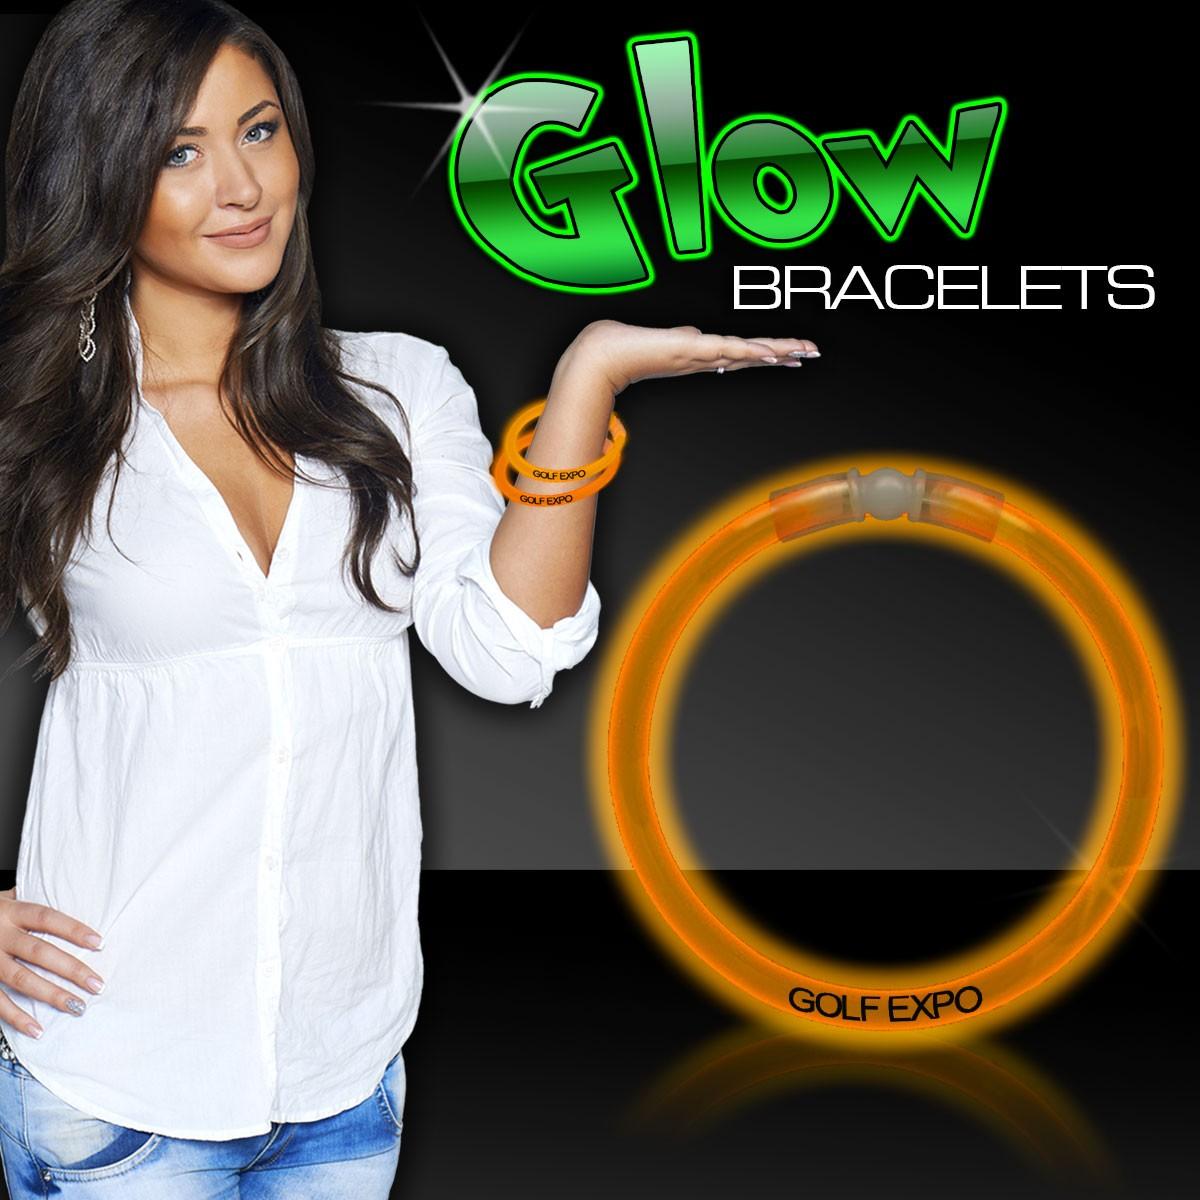 Orange Superior 8 Inch Glow Bracelets